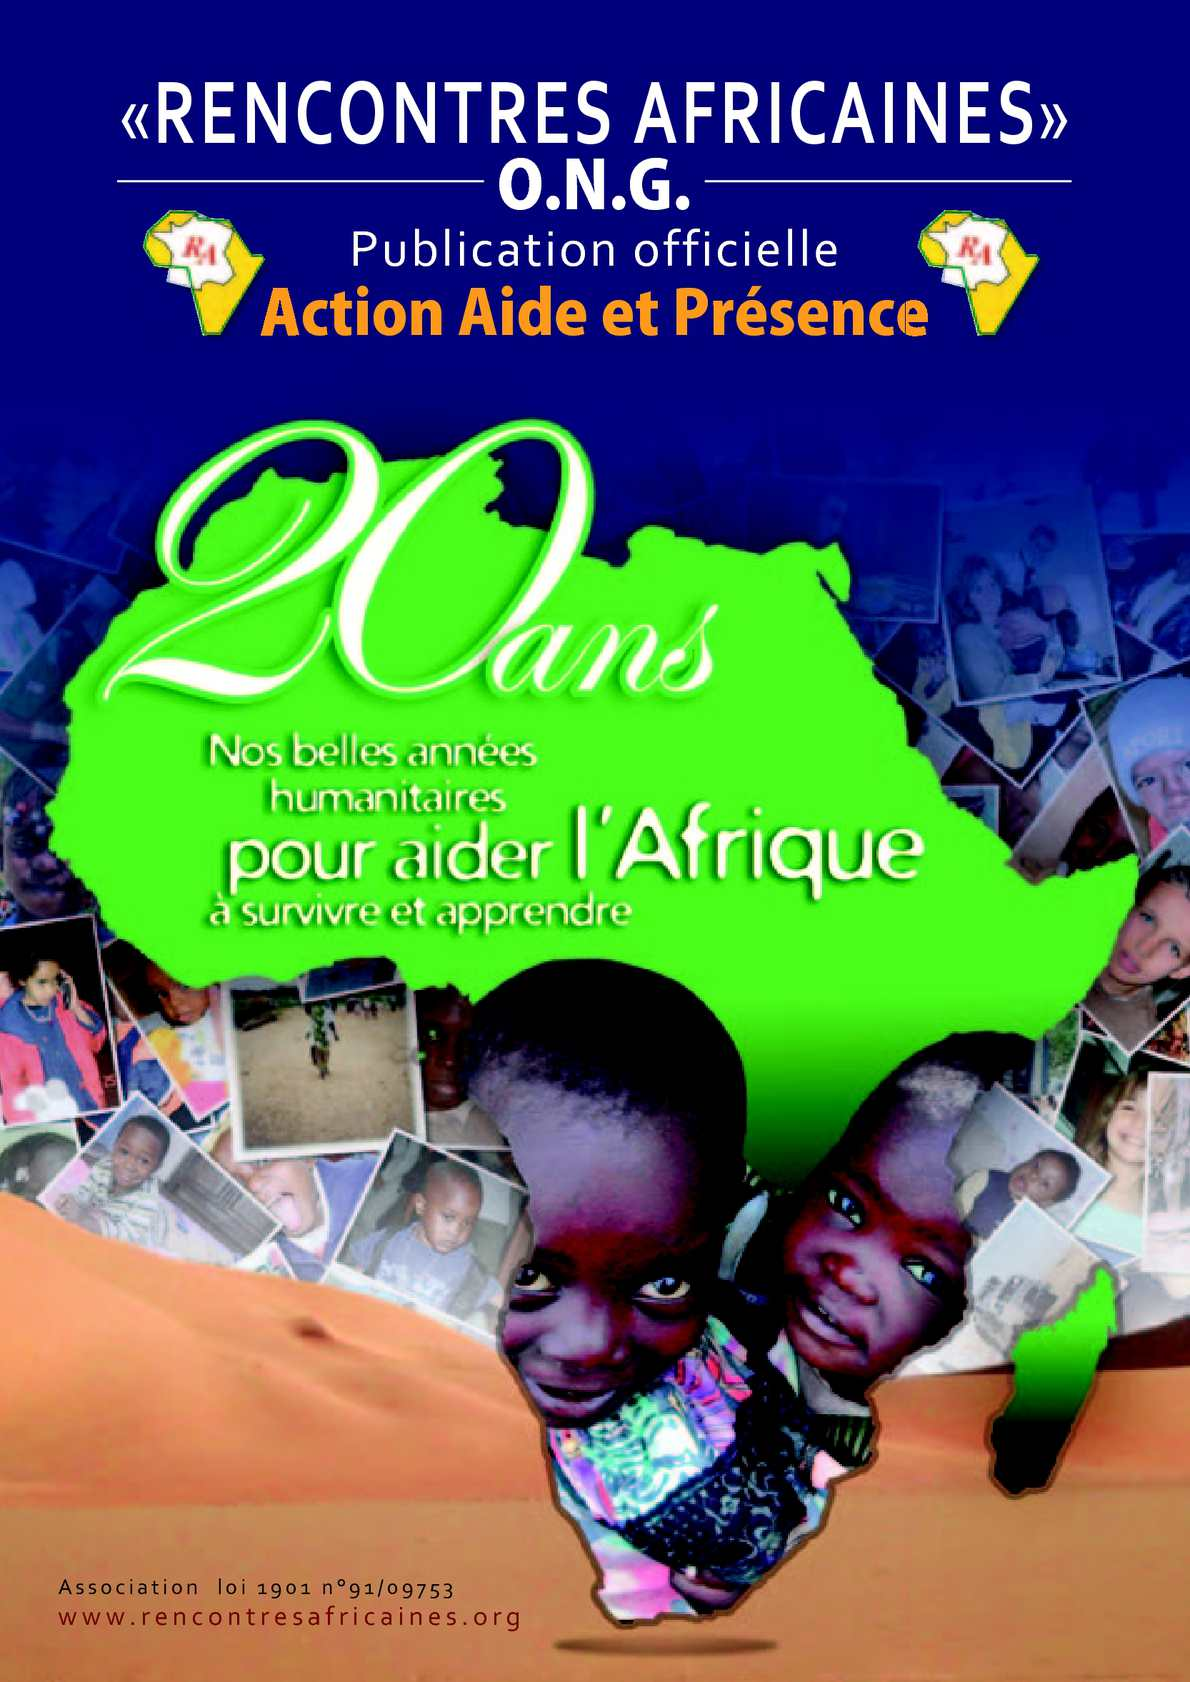 Rencontres Africaine Association – france-stage.fr